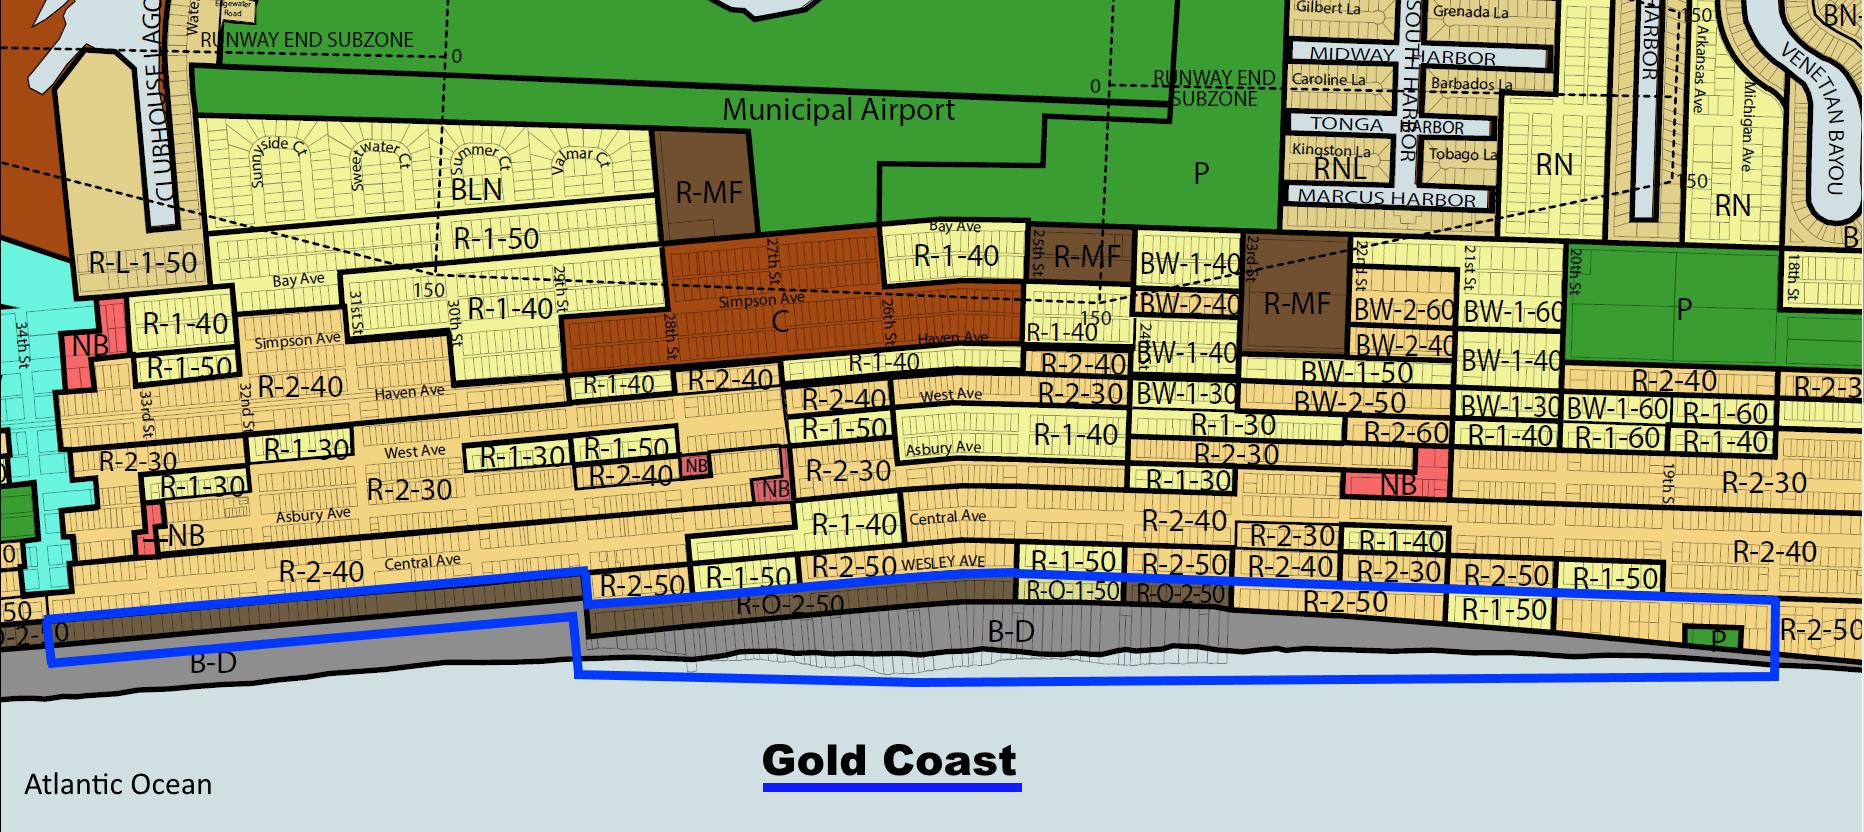 OCNJ Gold Coast Quick Search